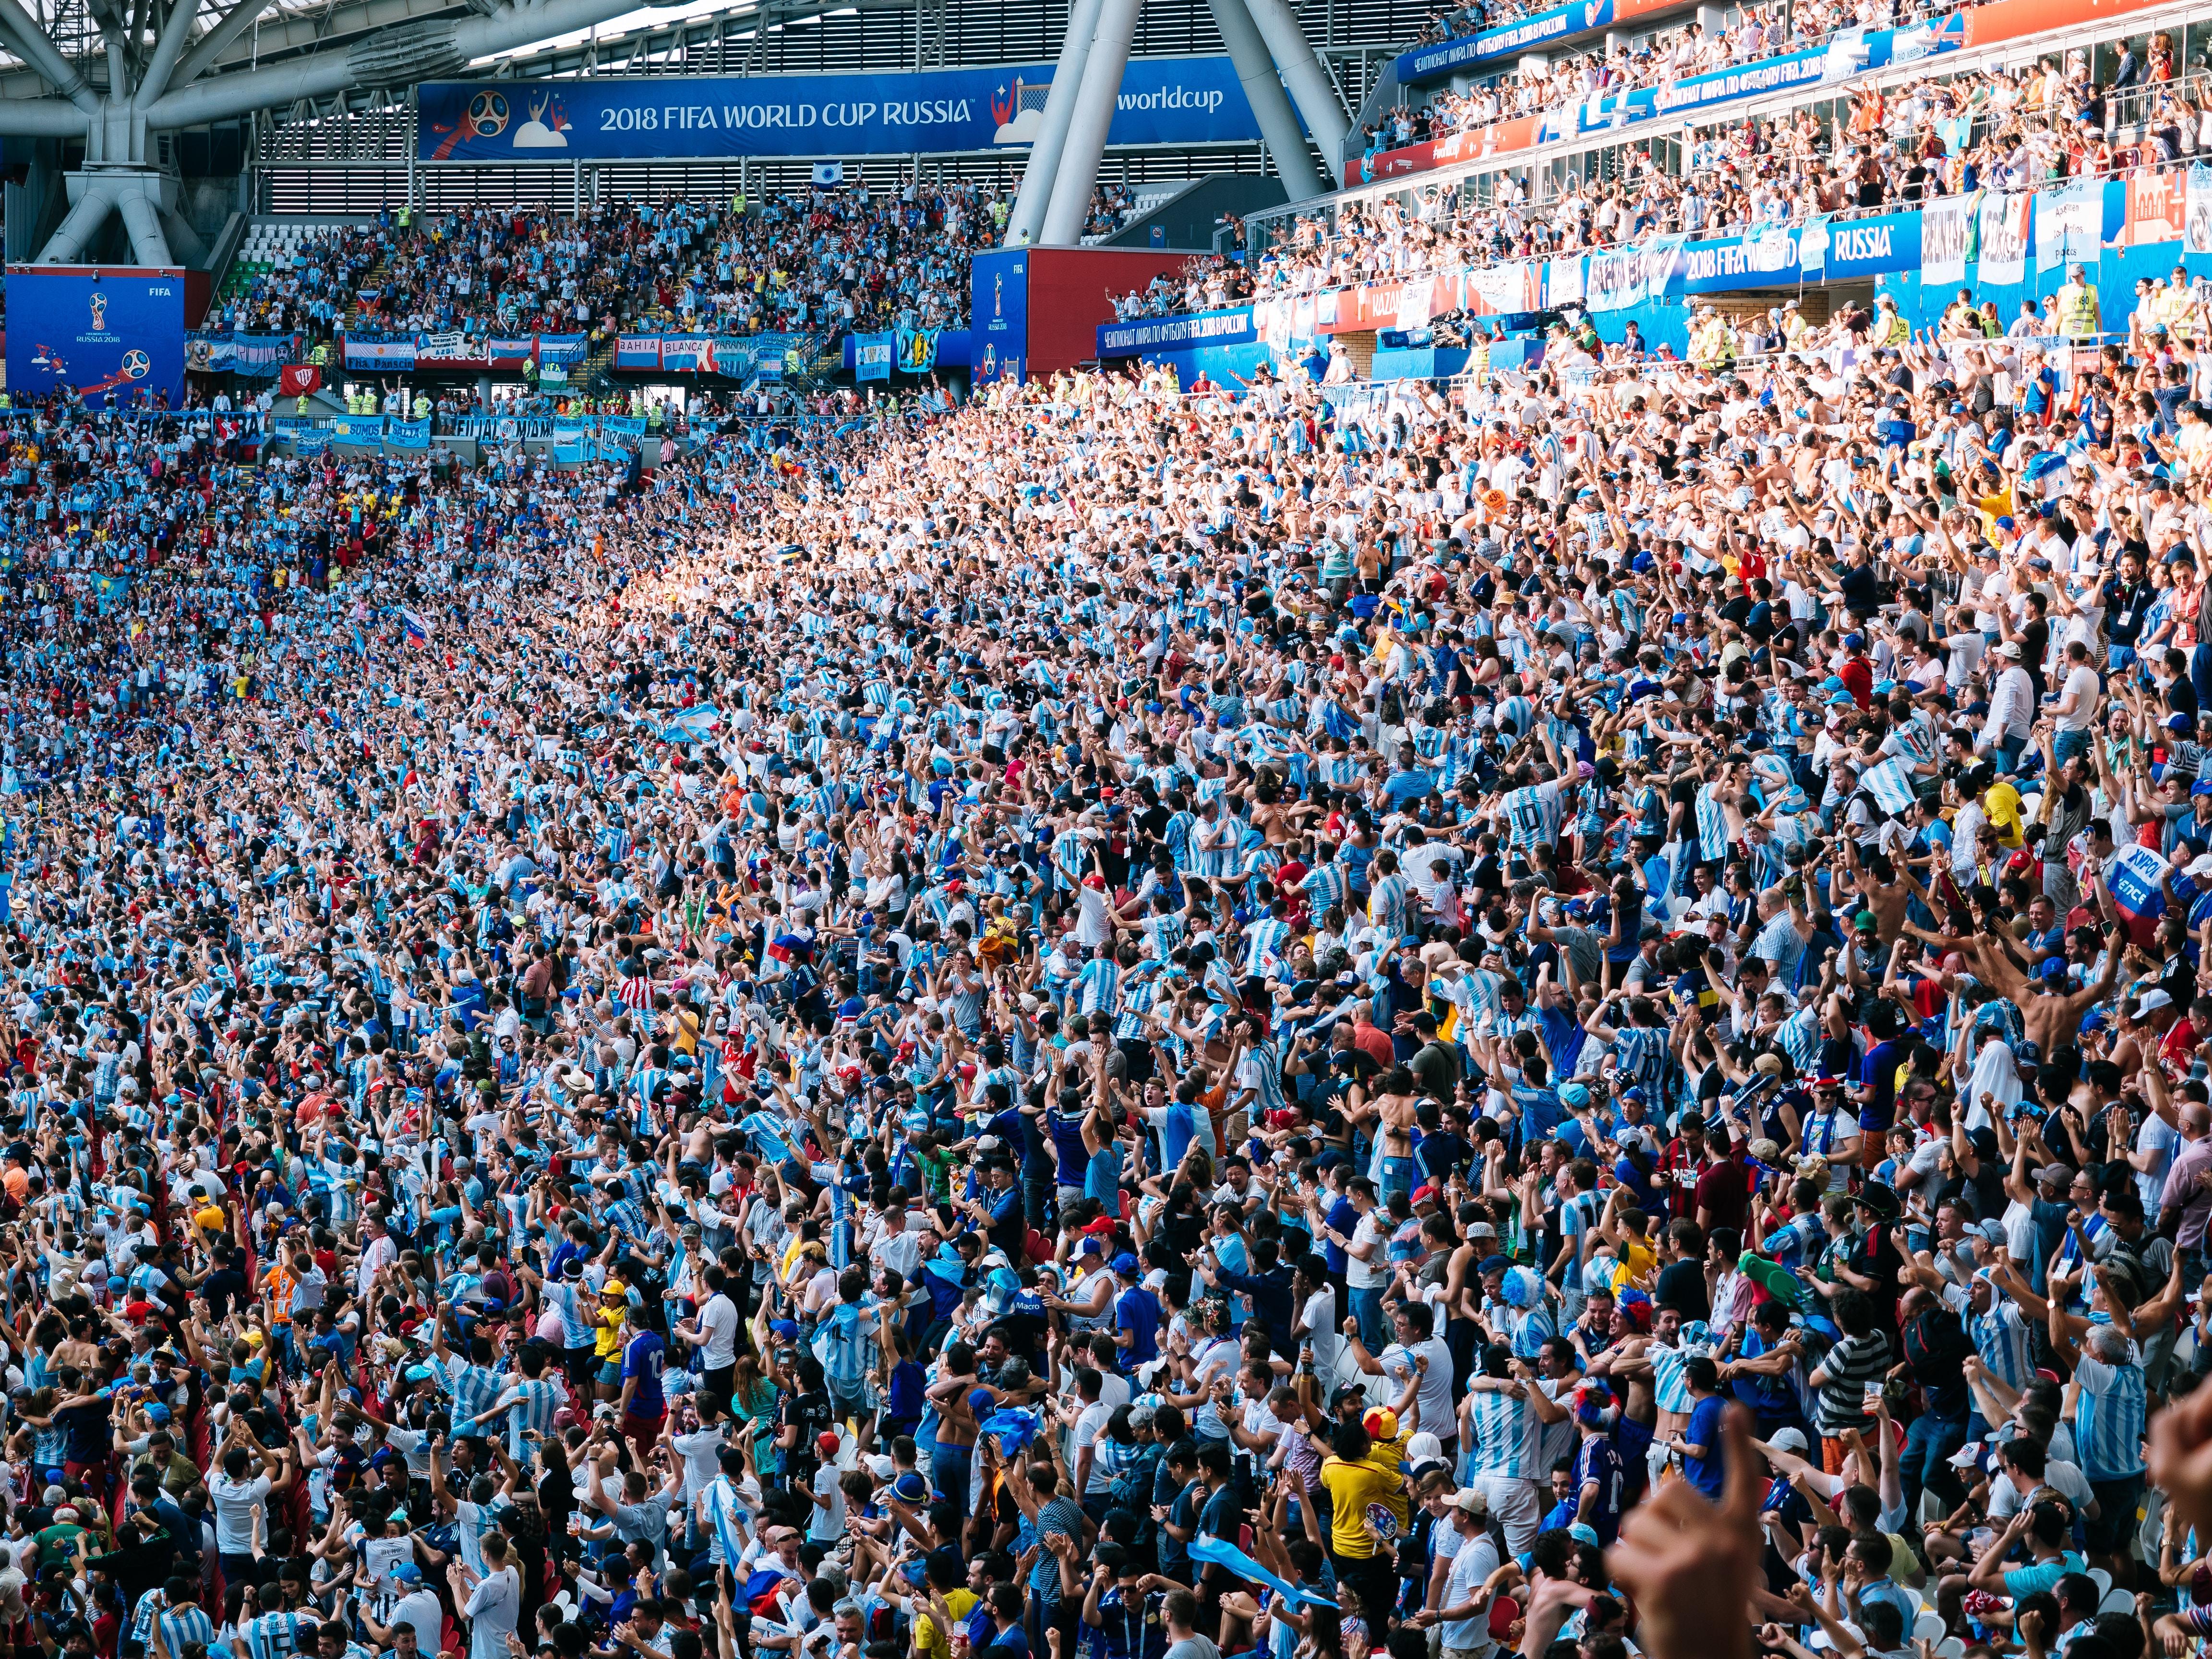 people cheering inside stadiums bleachers at daytime